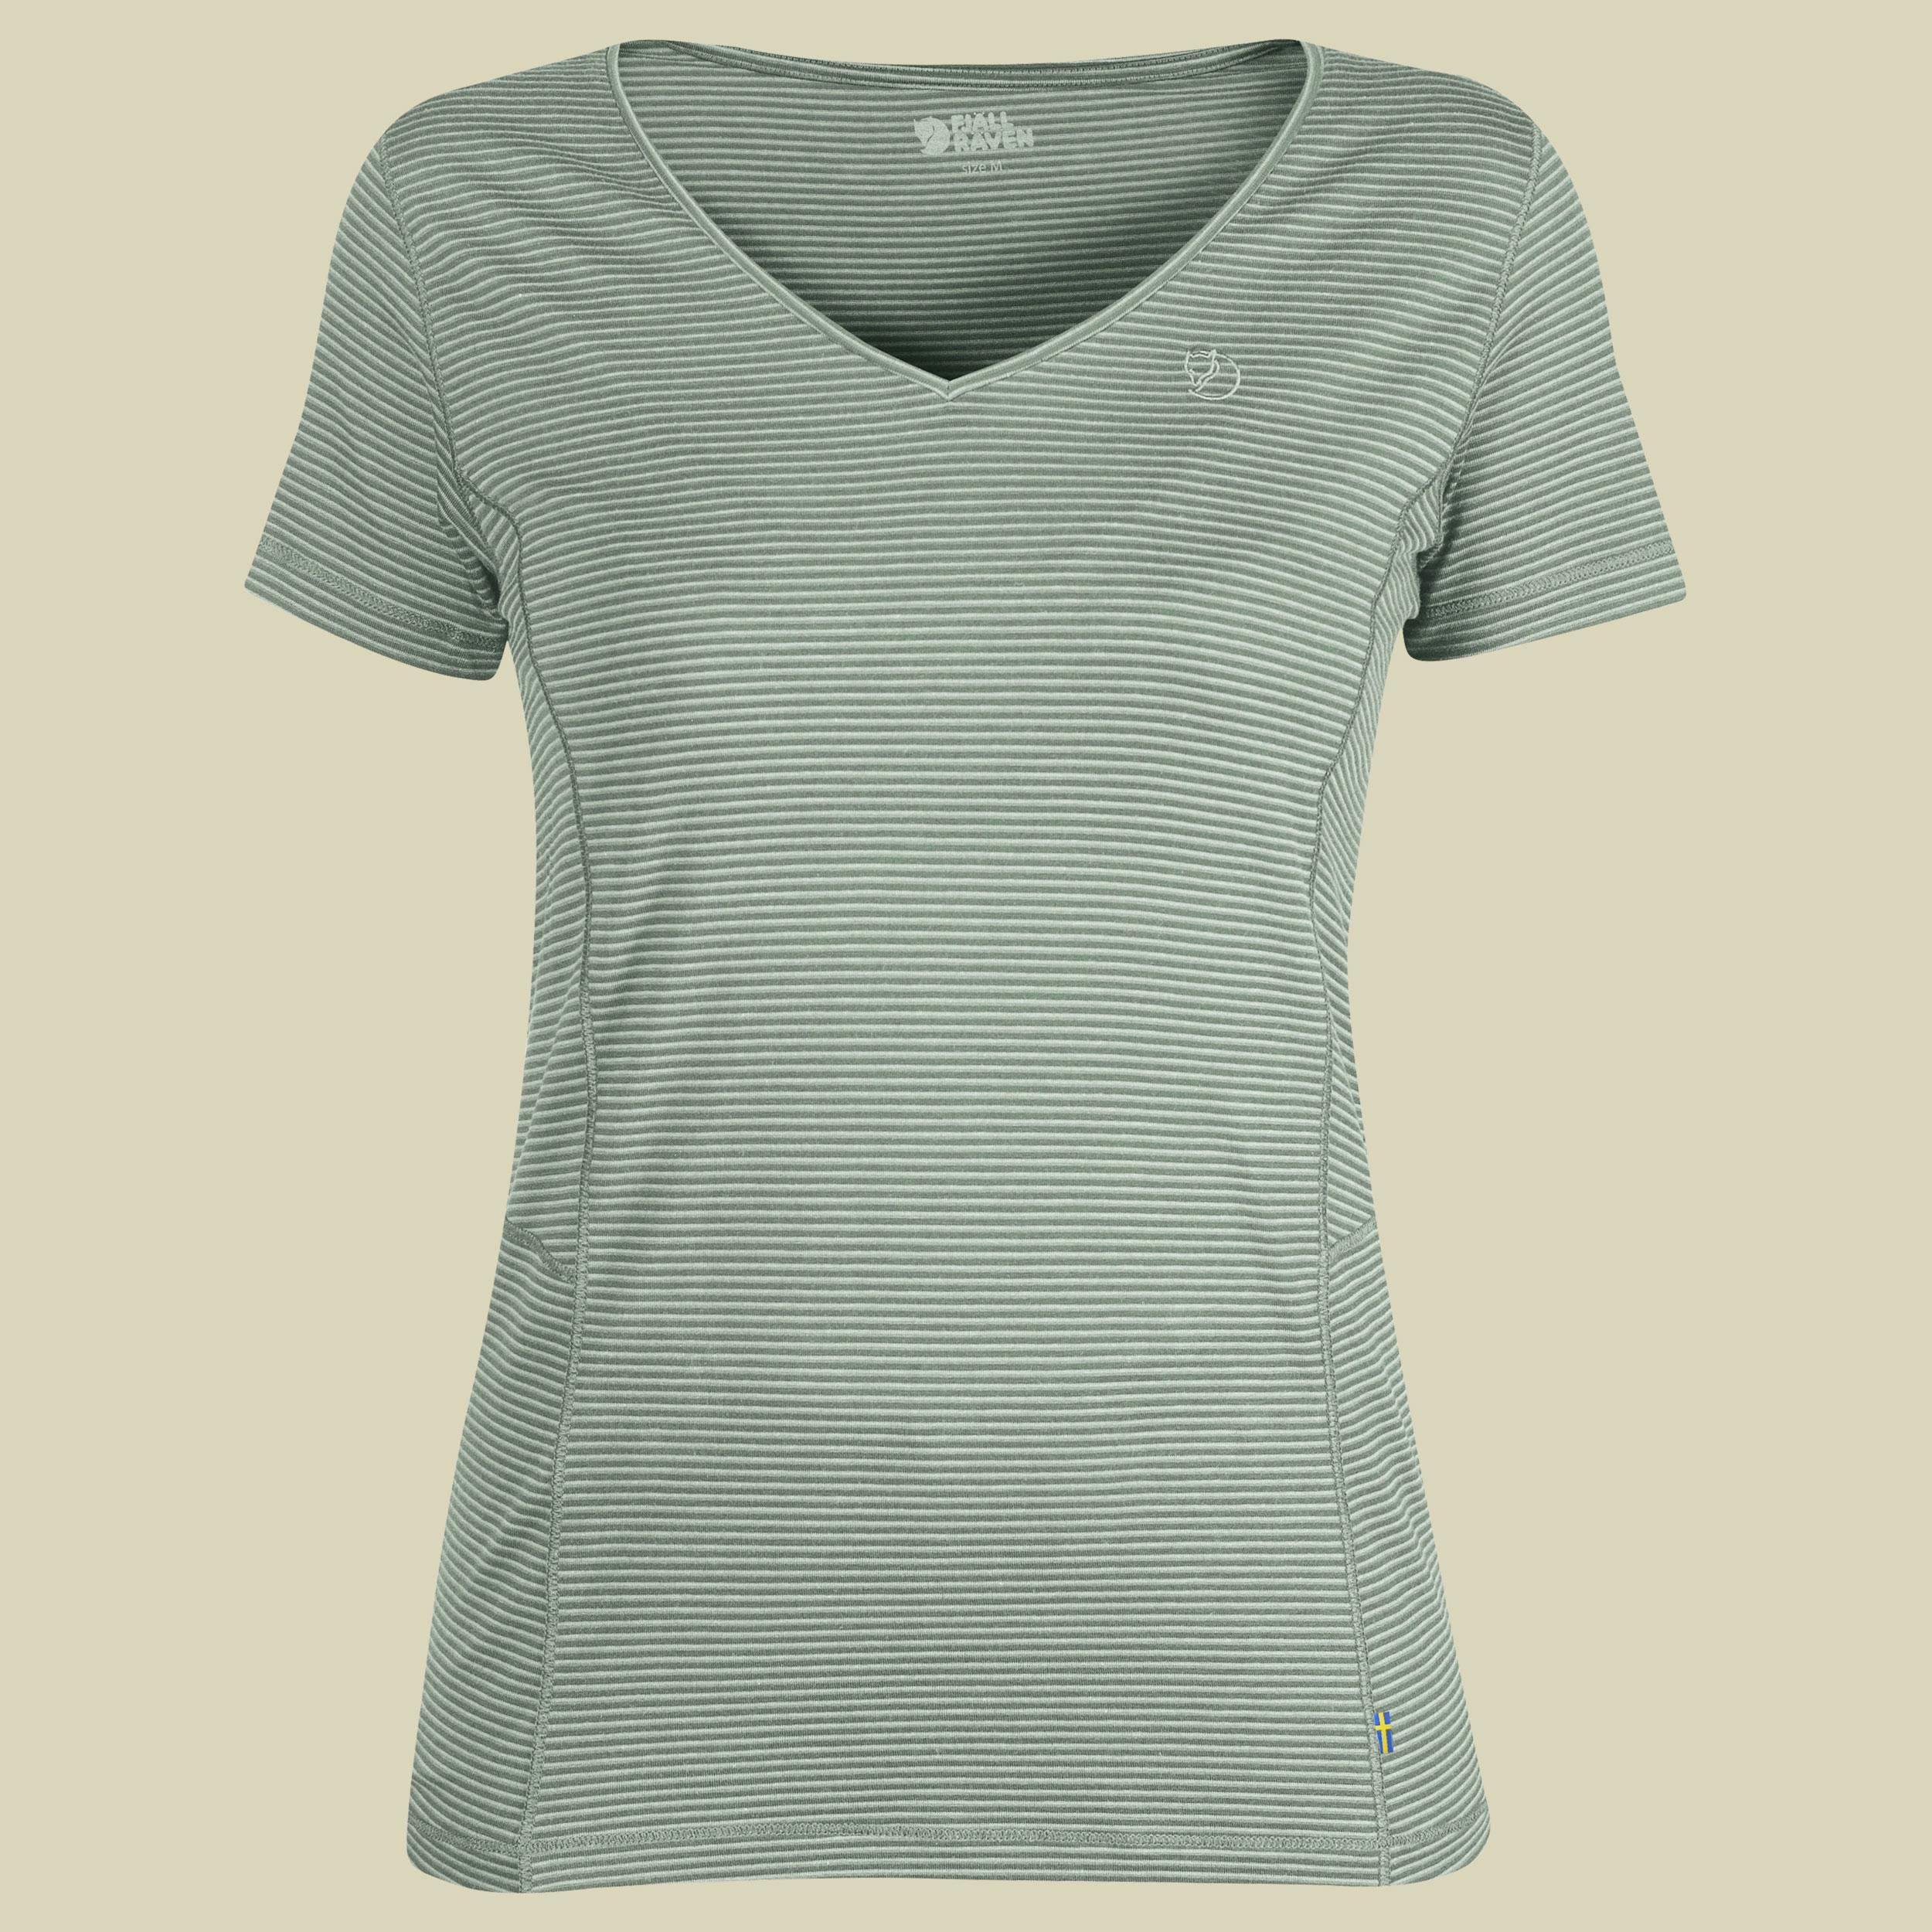 Image of Fjällräven Women's Abisko Cool T-Shirt Gr XS grau